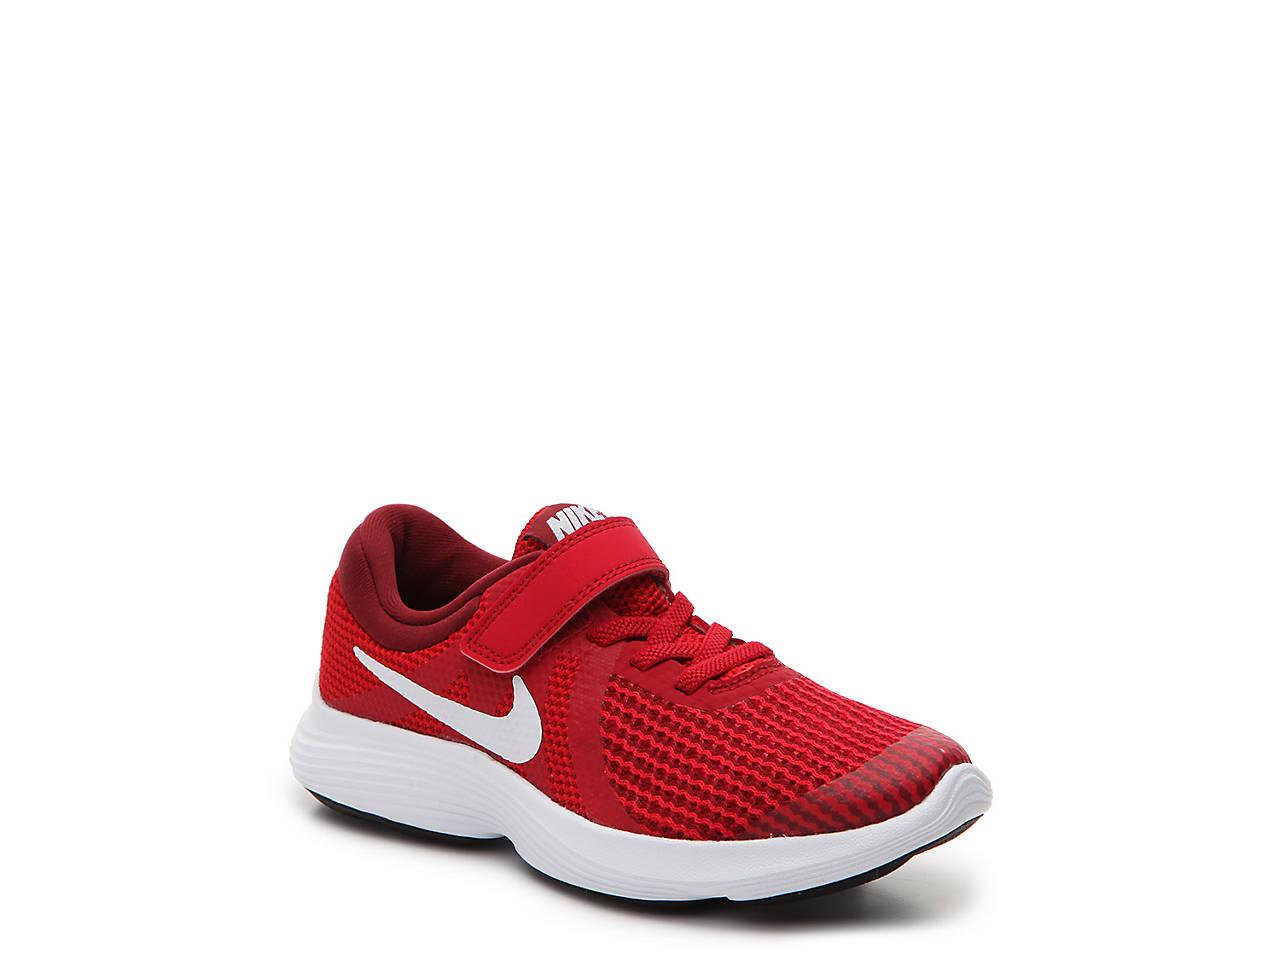 0e515ba5fa75 Nike Revolution 4 Toddler   Youth Running Shoe Kids Shoes